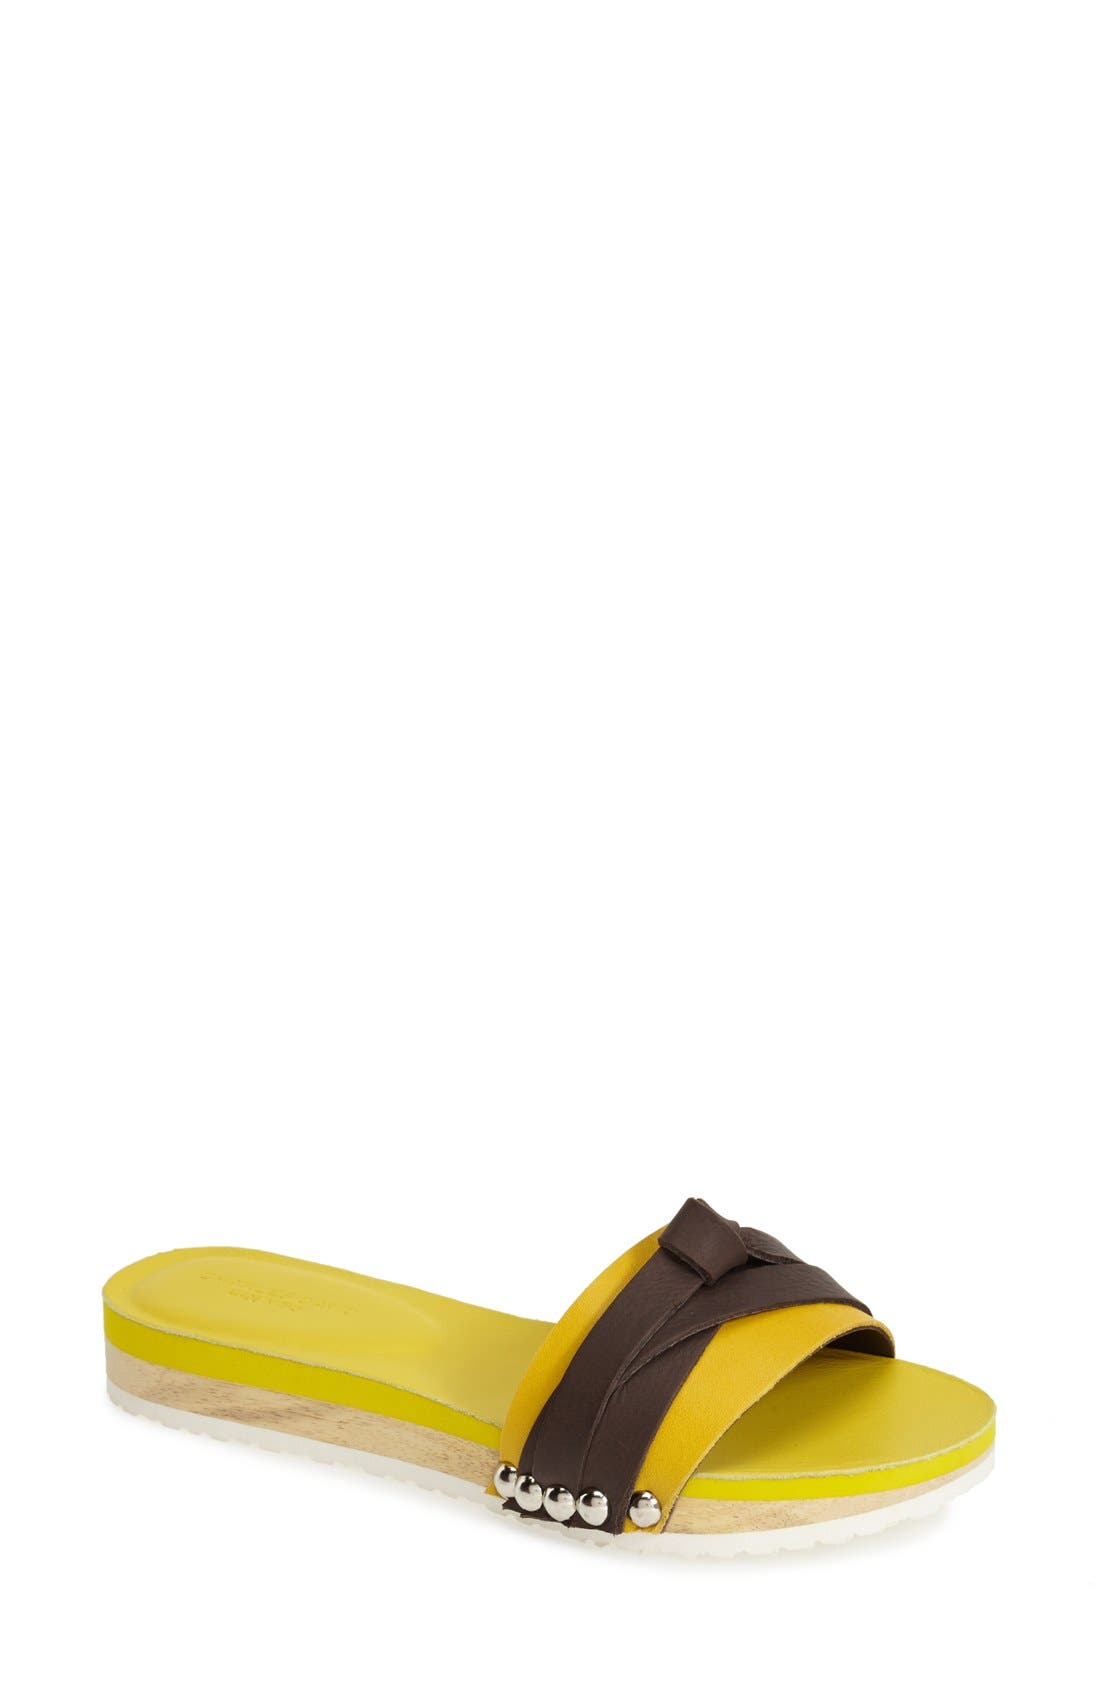 Alternate Image 1 Selected - Charles David 'Becket' Slide Sandal (Women)